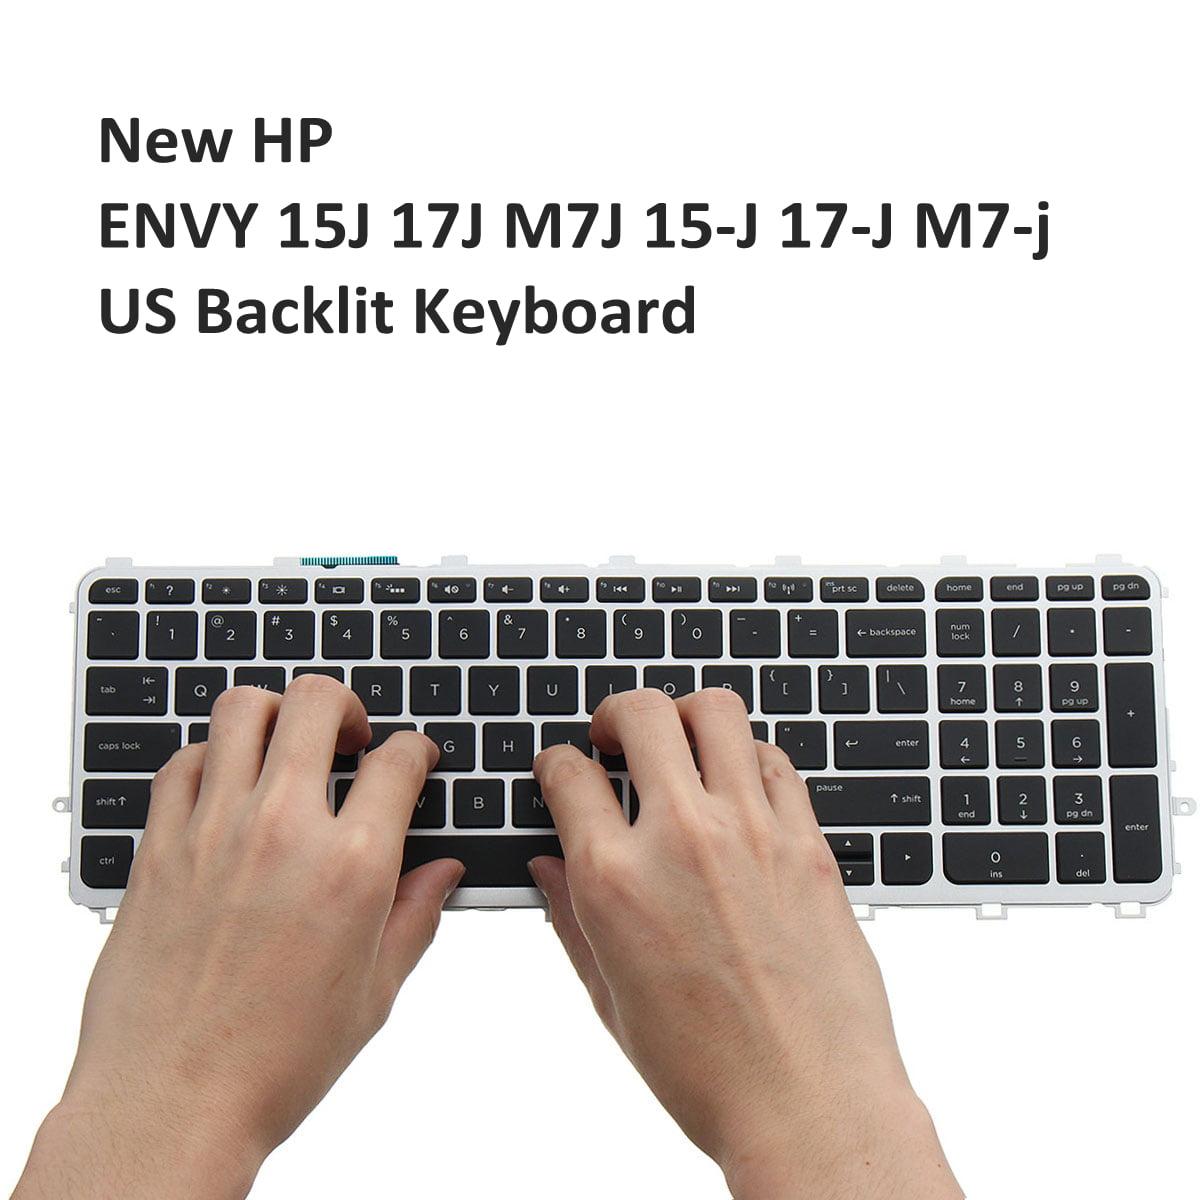 US Backlit Keyboard 720244-001 736685-001 FOR HP ENVY 15J 17J M7J 15-J 17-J M7-J